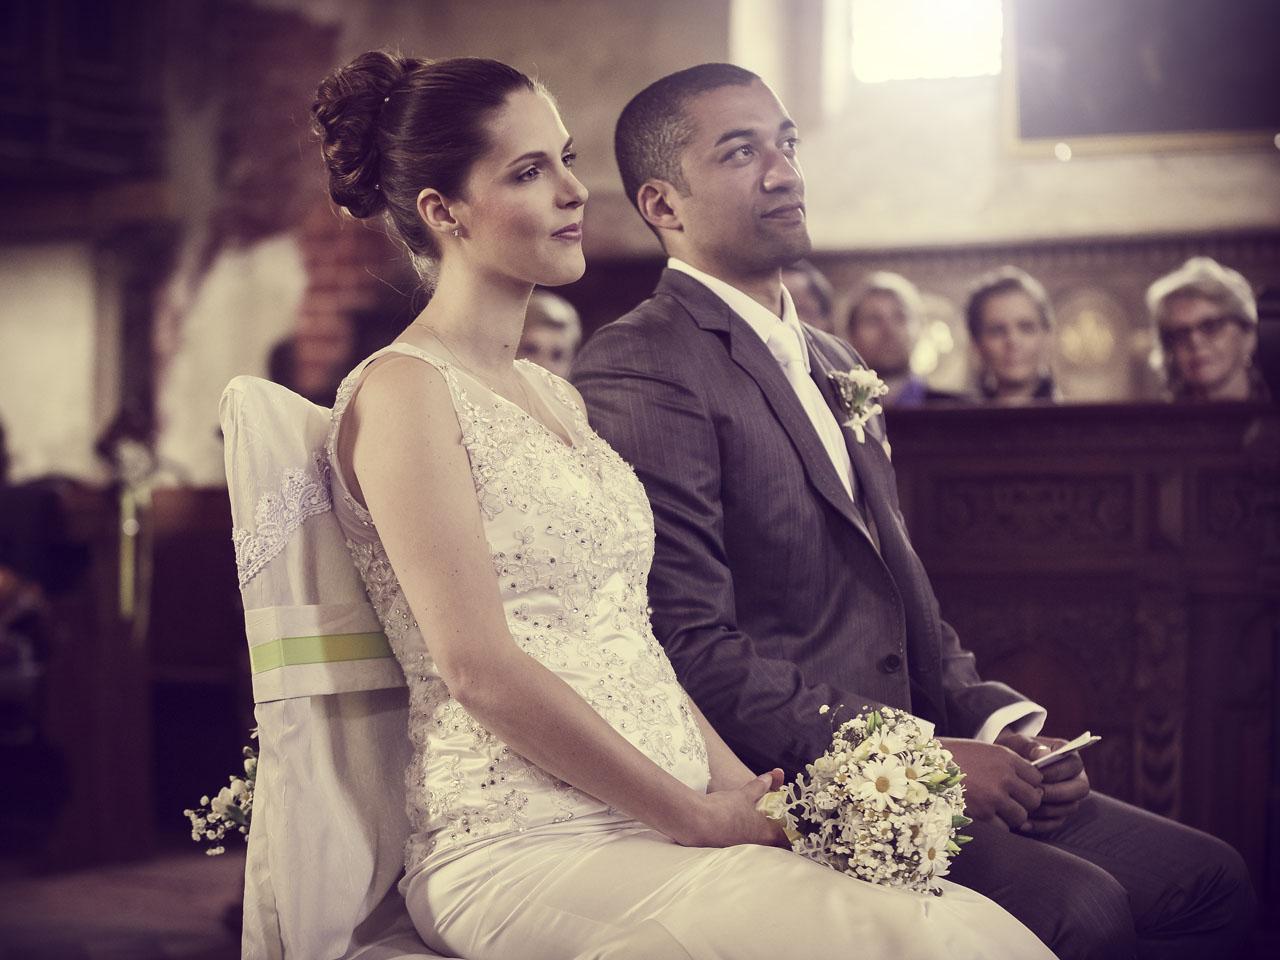 Robin szolkowy wedding